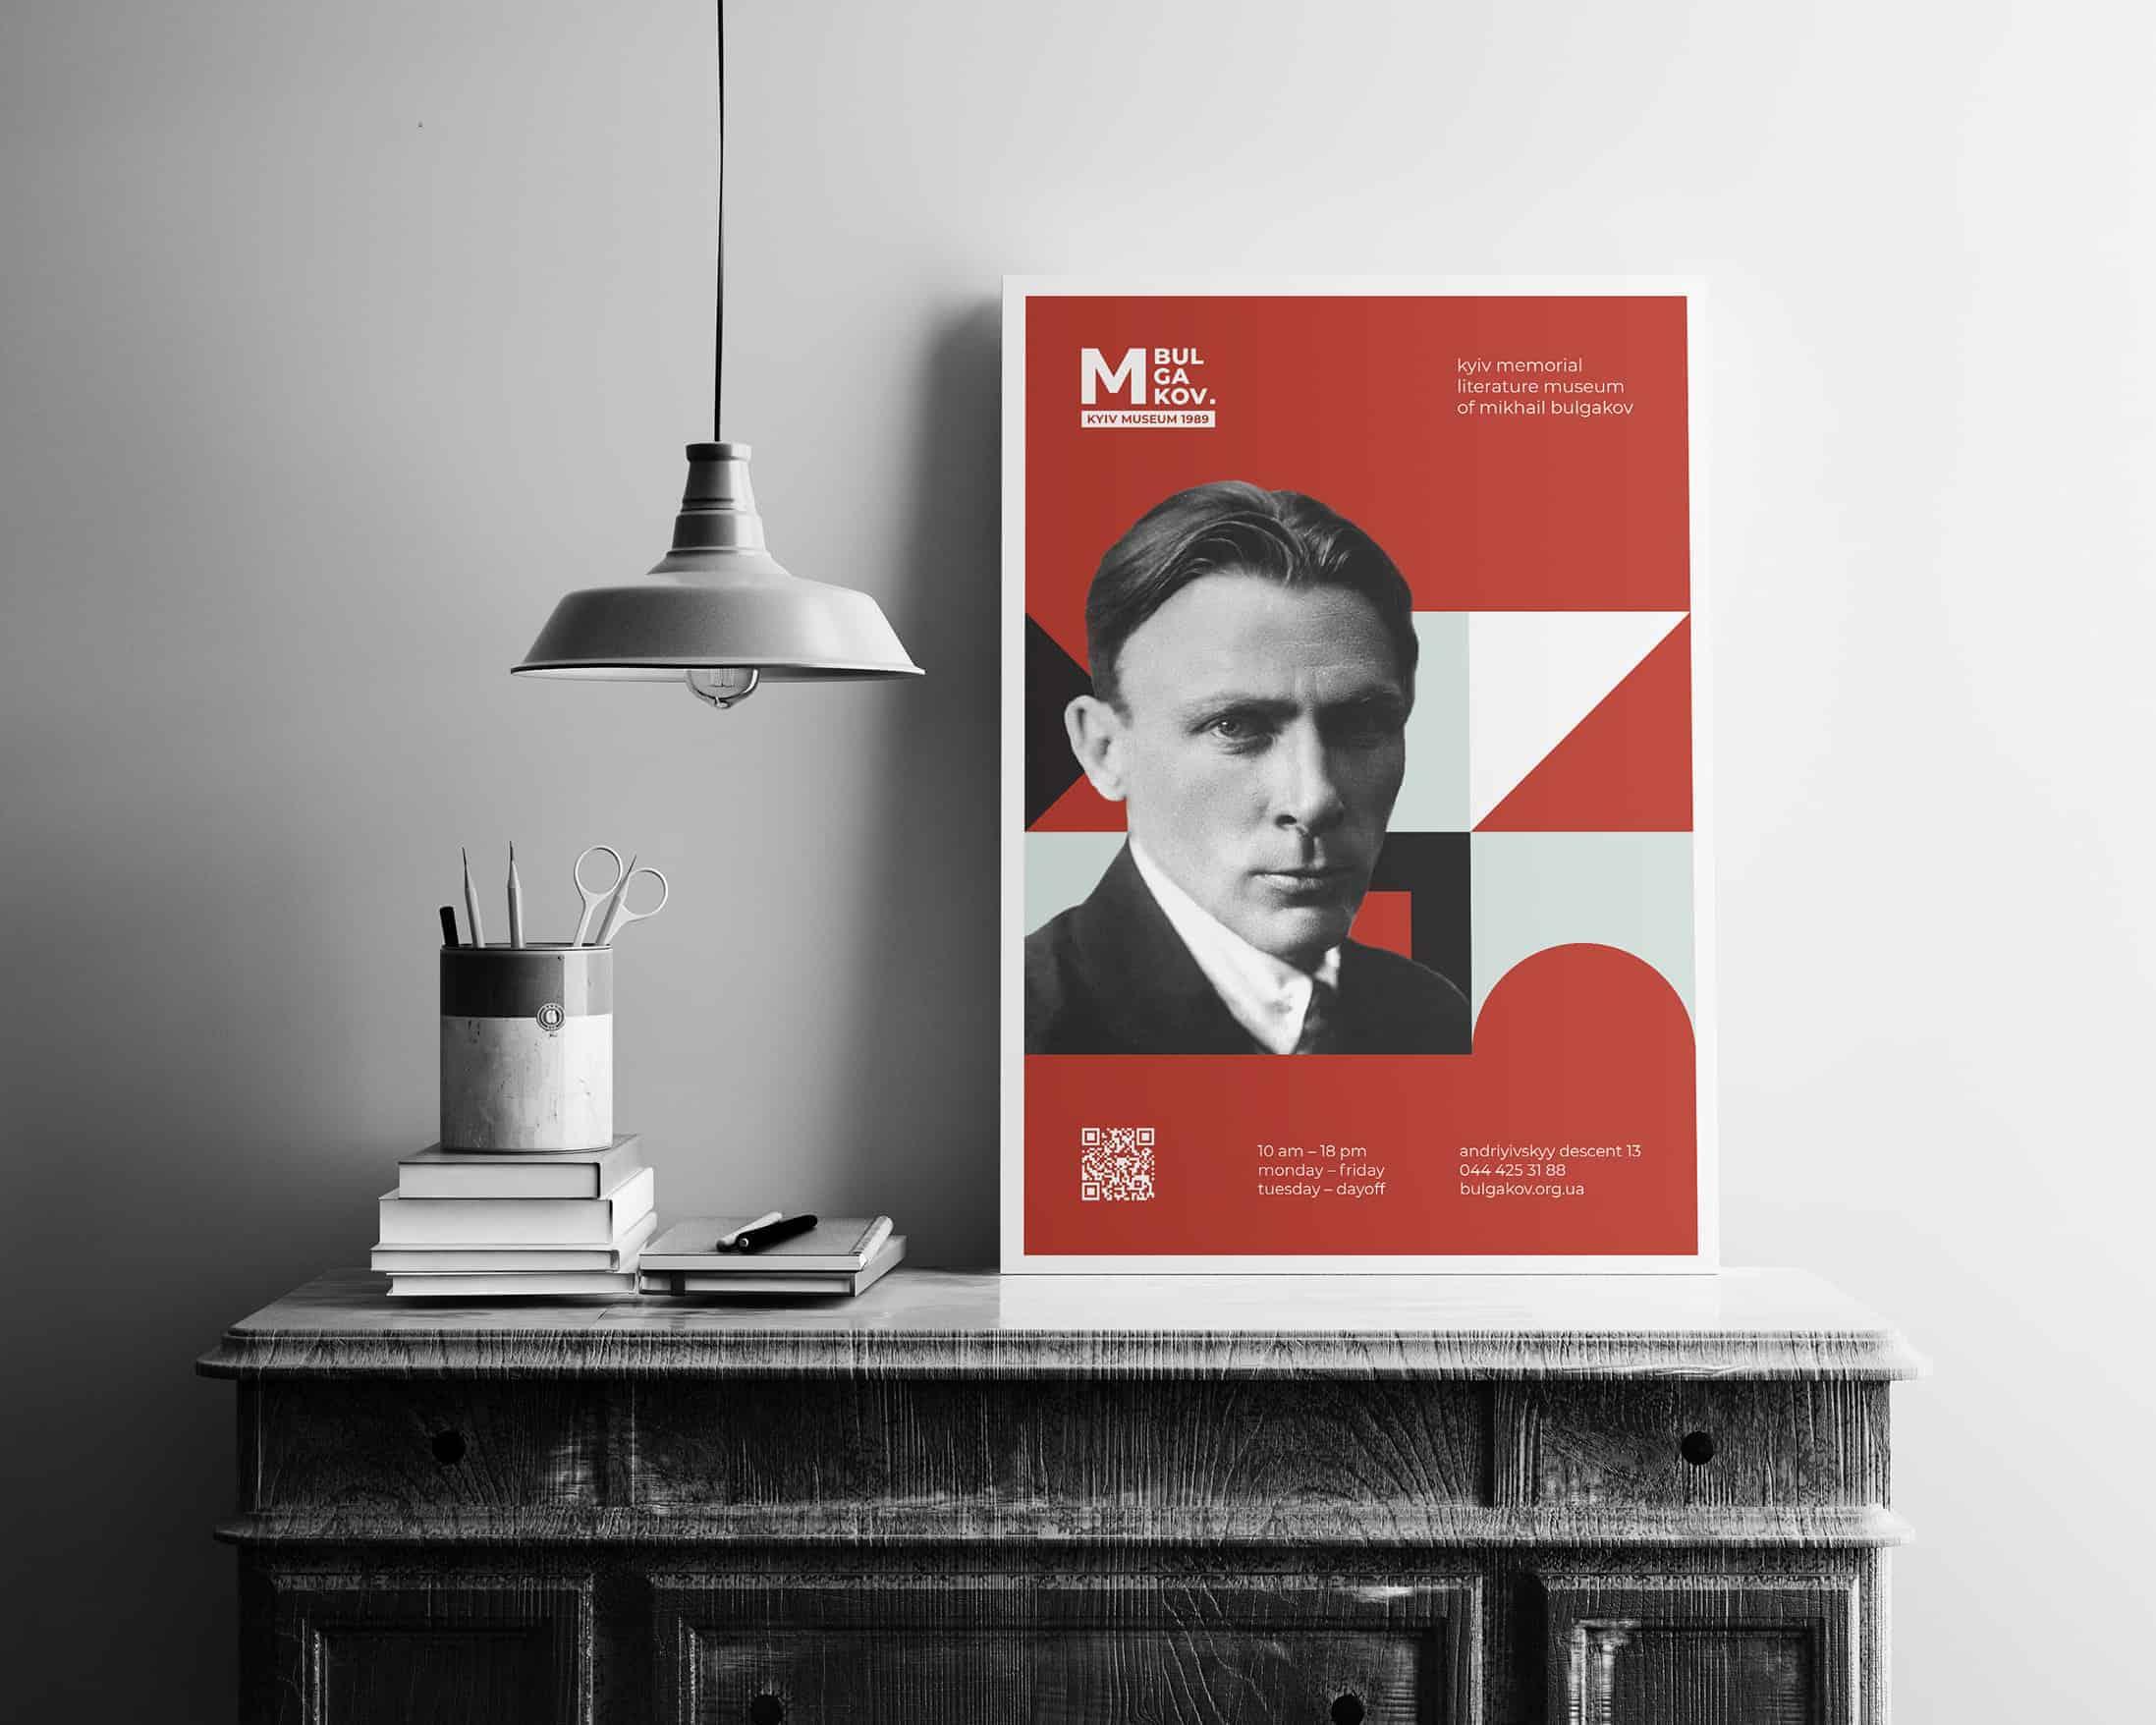 MIKHAIL BULGAKOV MUSEUM logo and identity